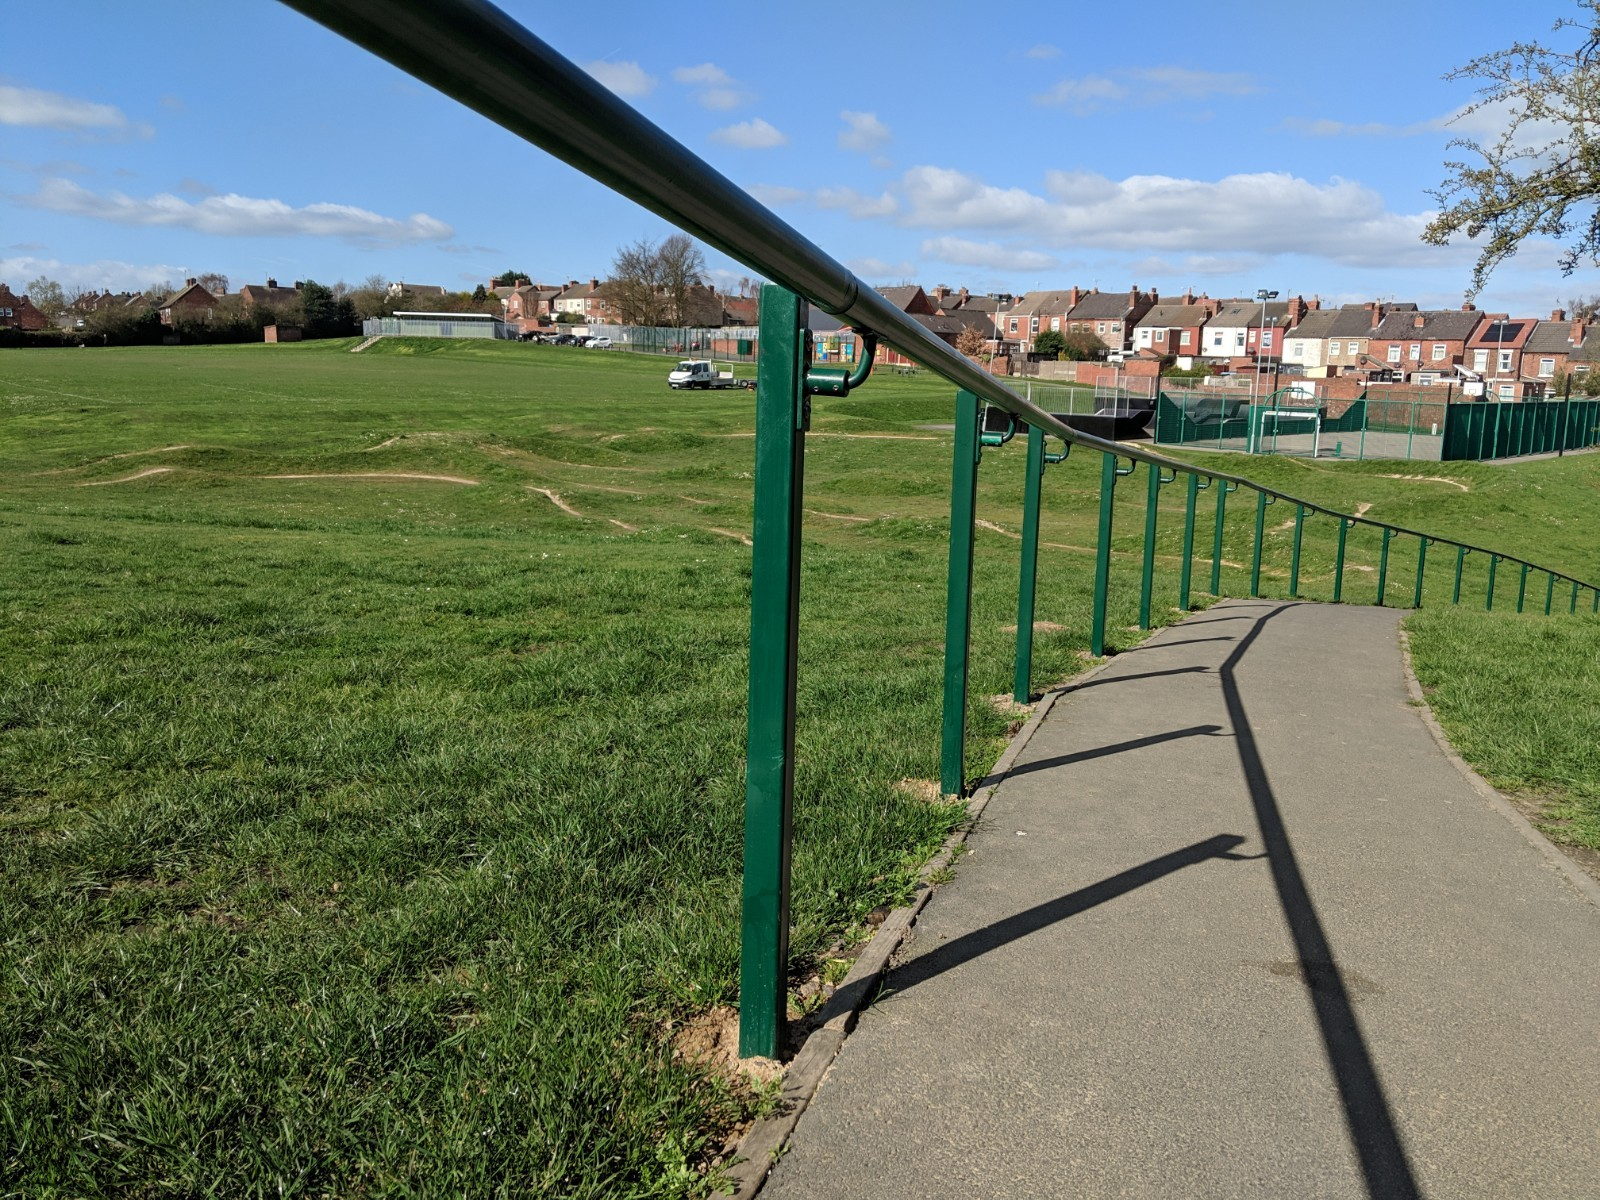 South Normanton Handrail